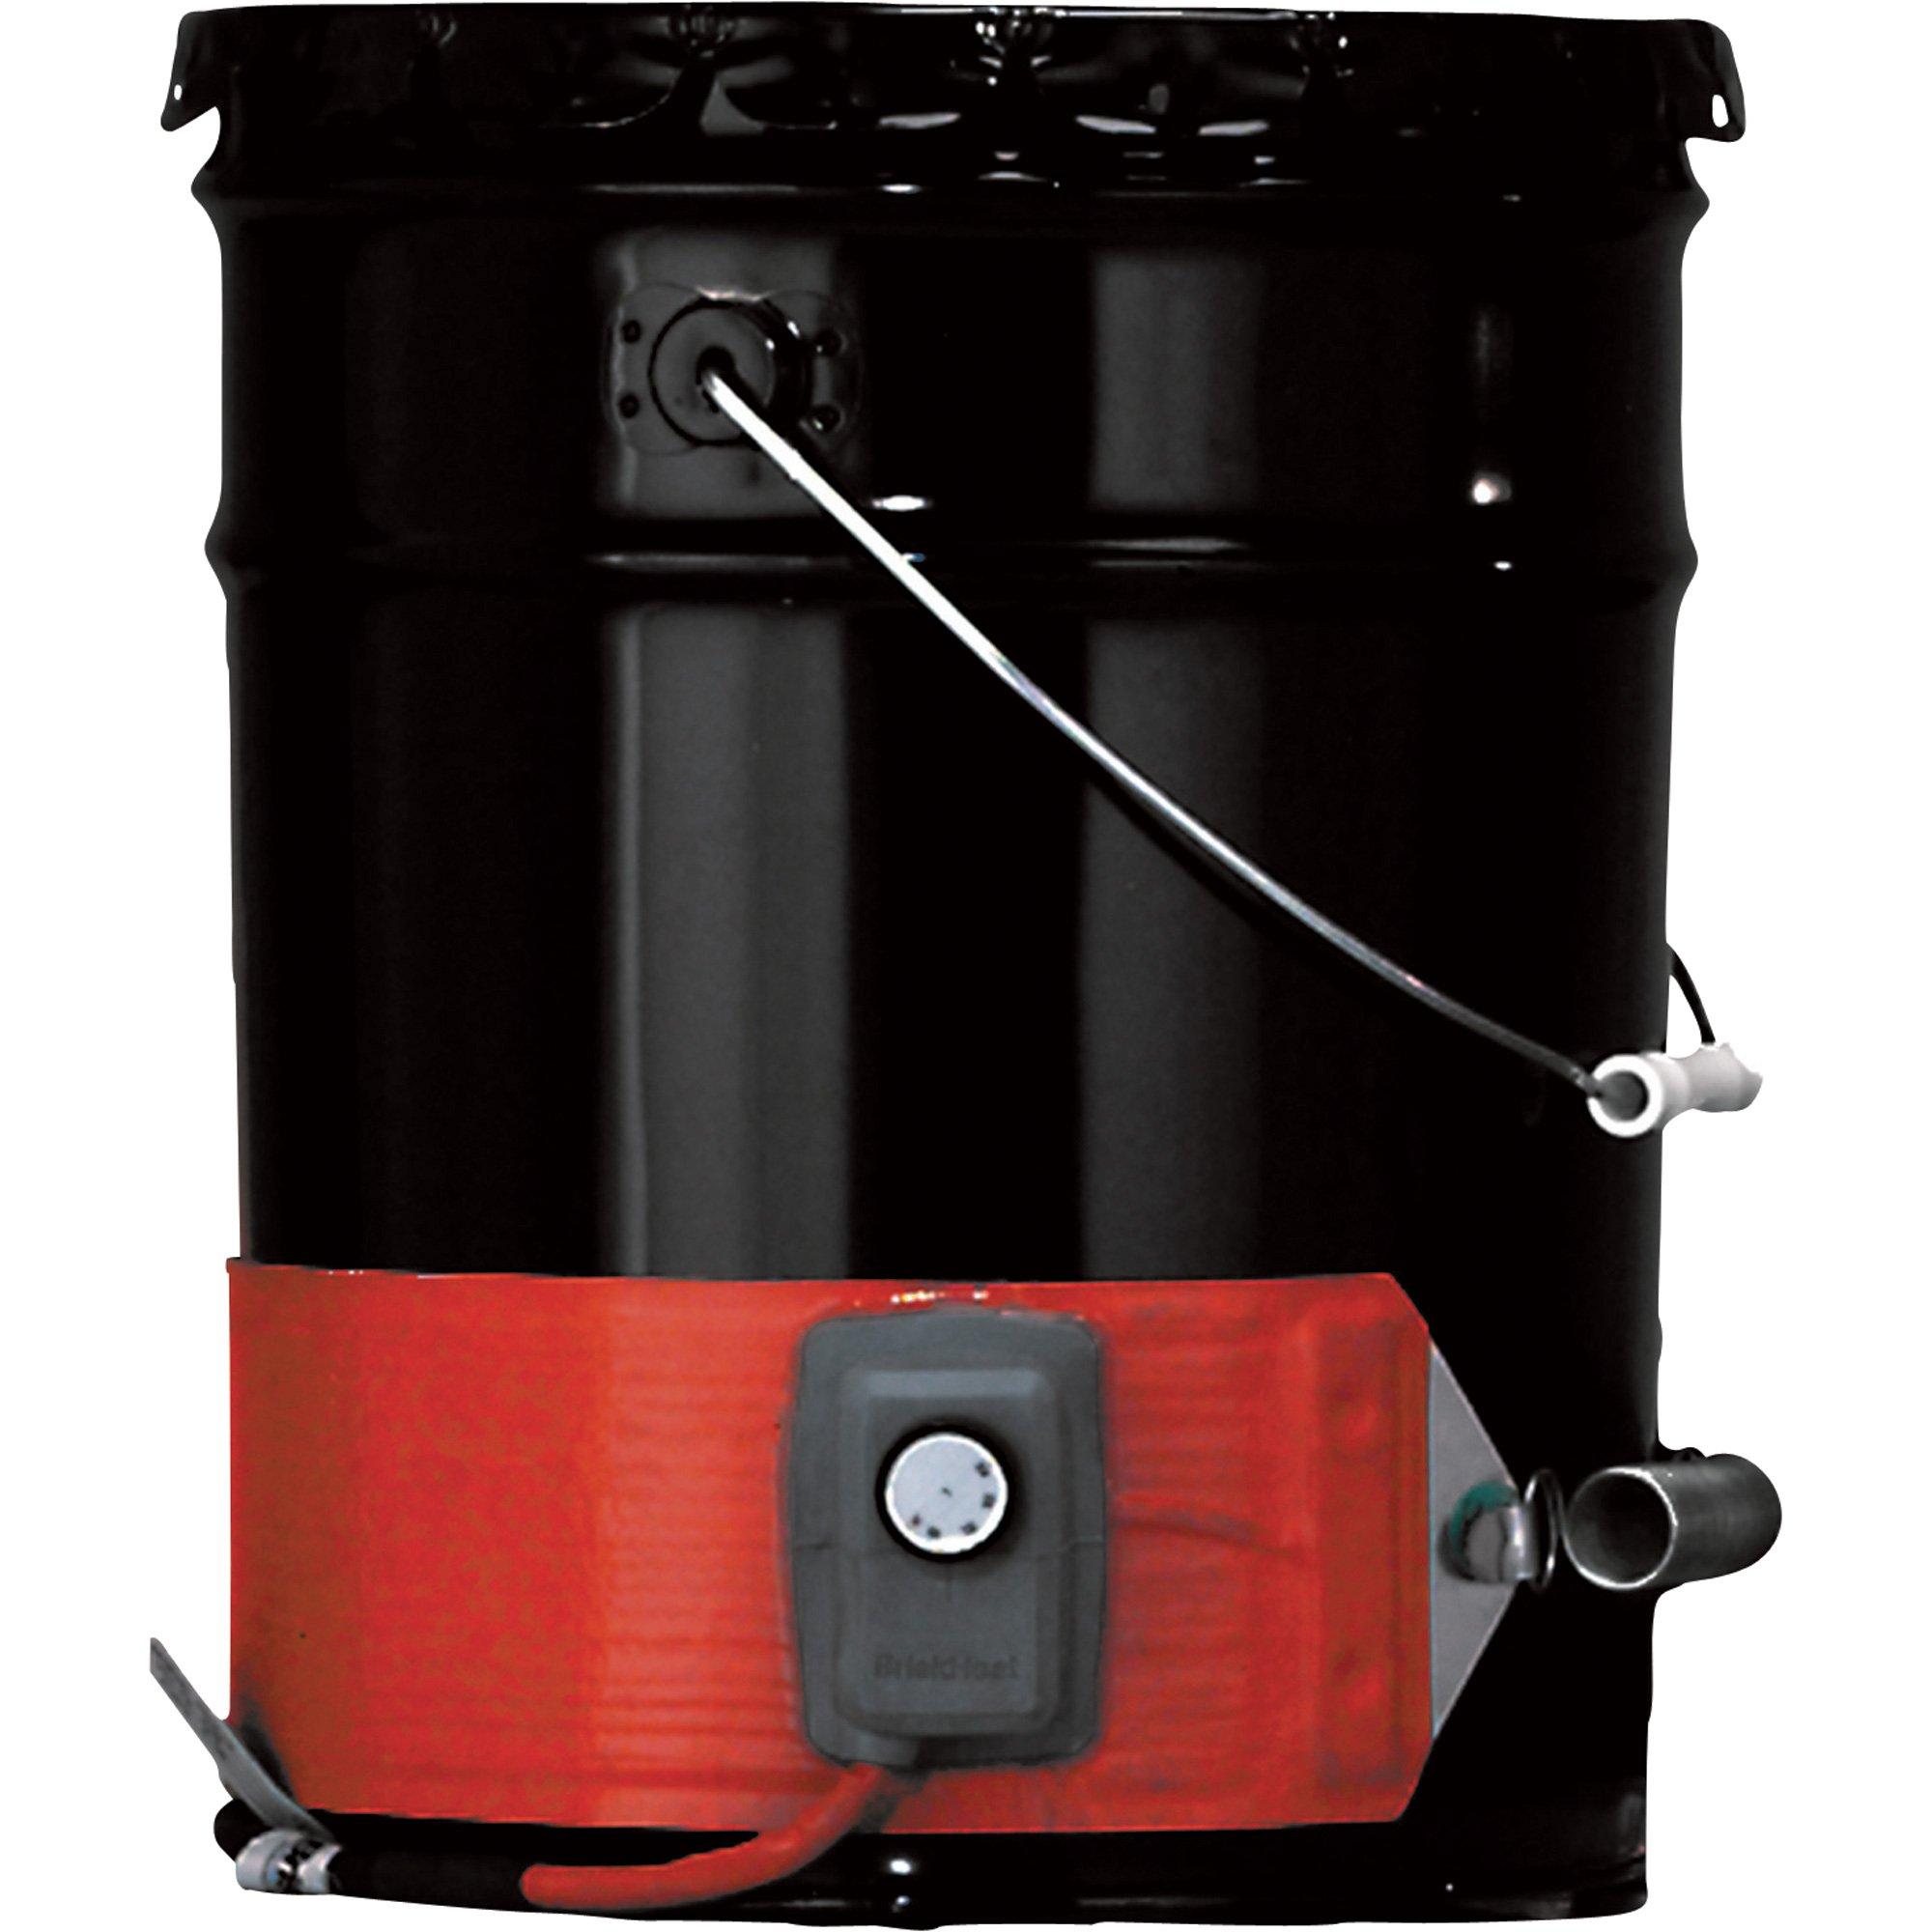 BriskHeat Metal Drum Heater - 5-Gallon, 550 Watt, 120 Volt, Model# DHCS10 by BriskHeat (Image #1)